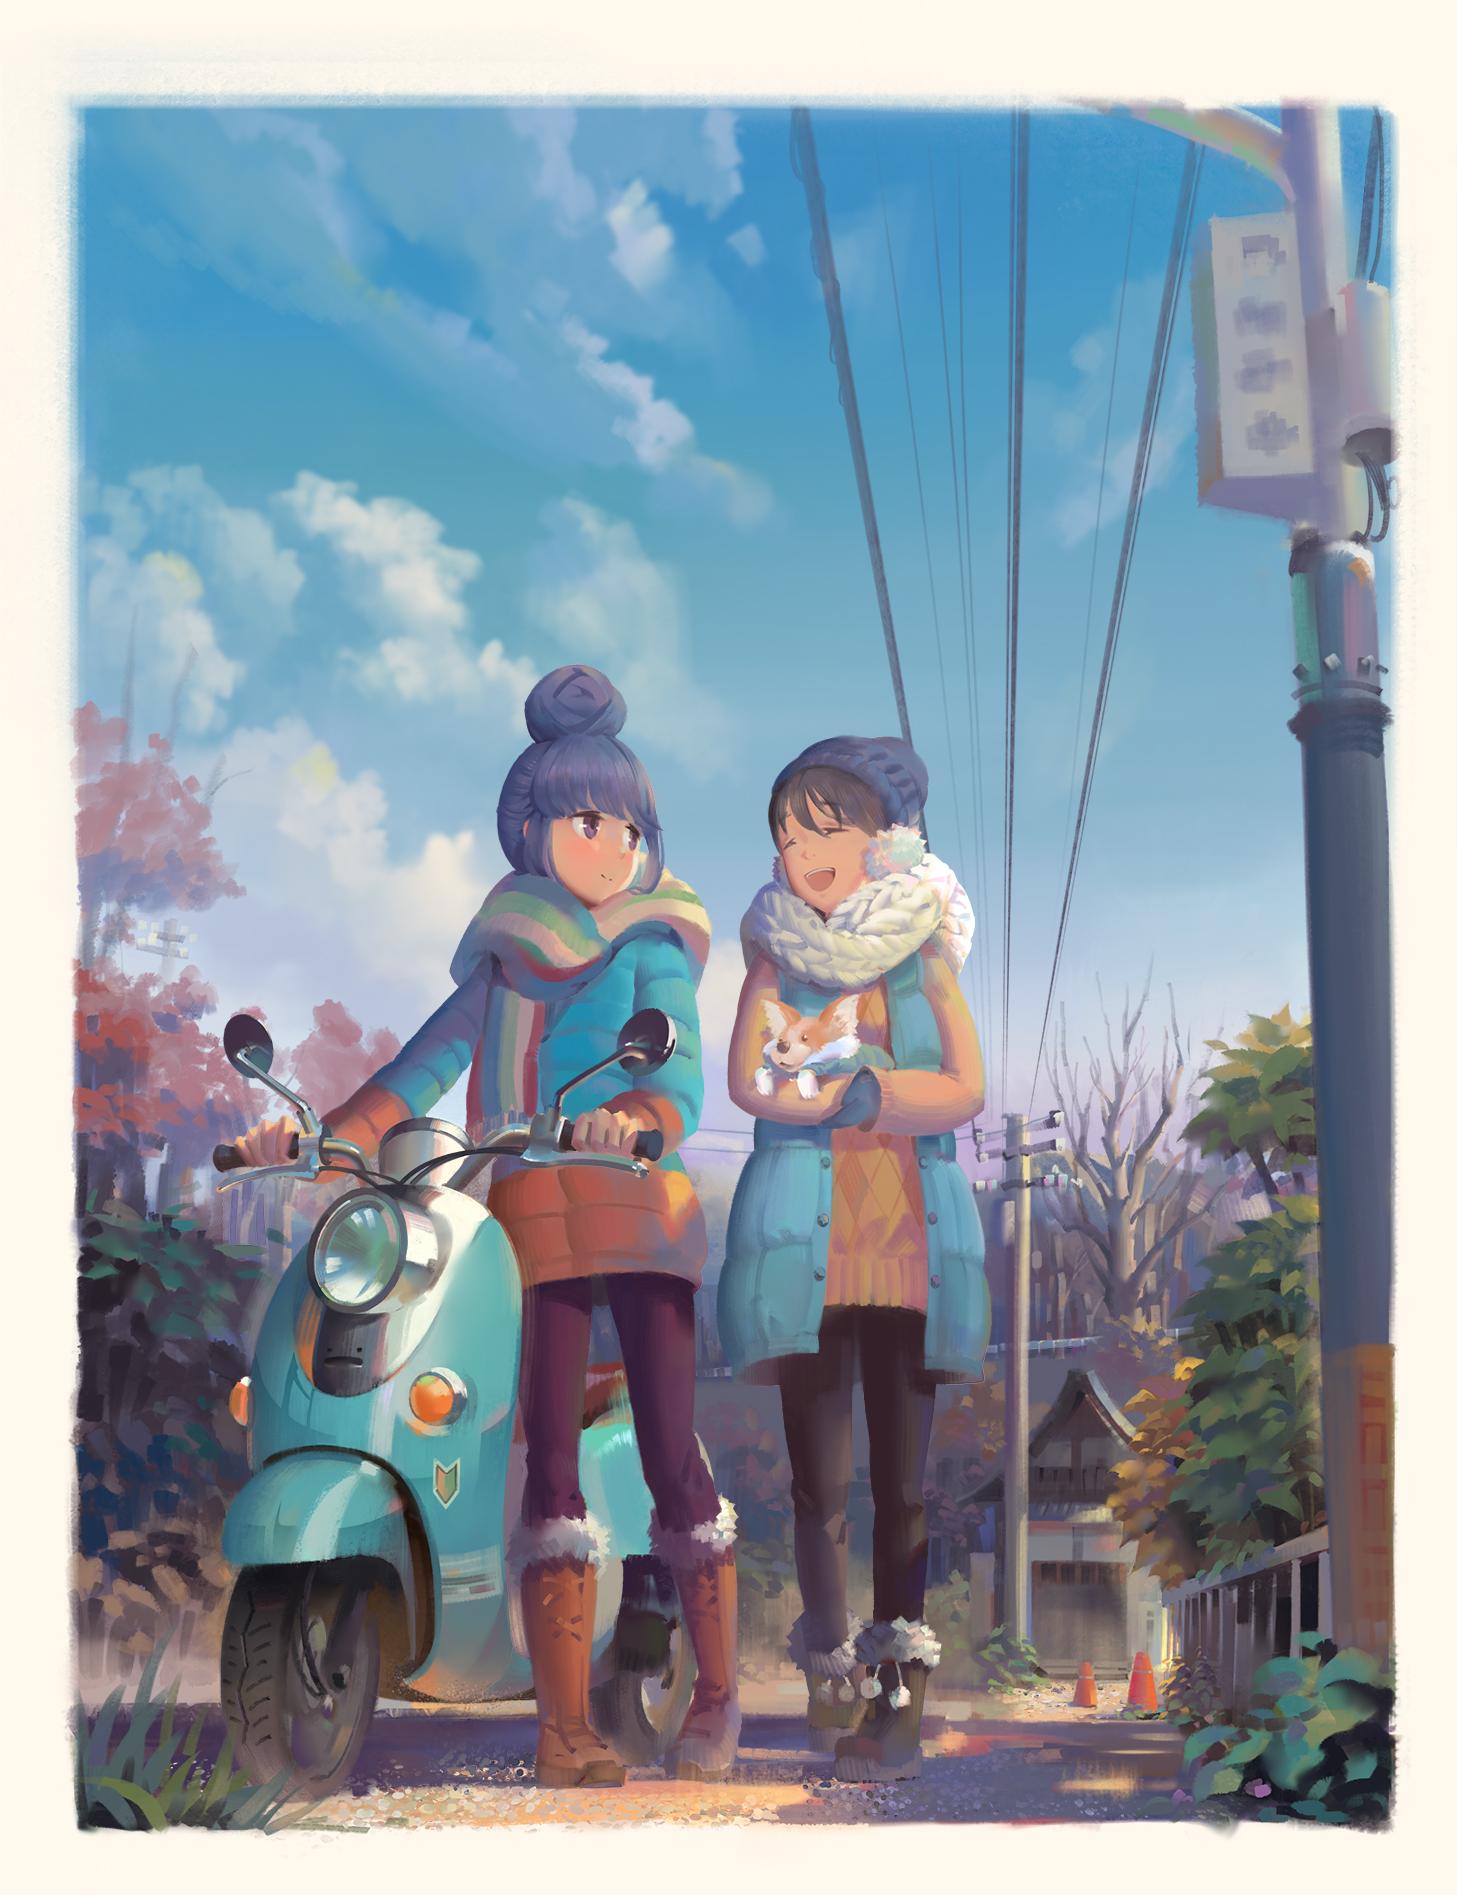 Wallpaper Yuru Camp Anime Girls Rin Shima Ena Saitou 1457x1895 Gamehater 1399657 Hd Wallpapers Wallhere